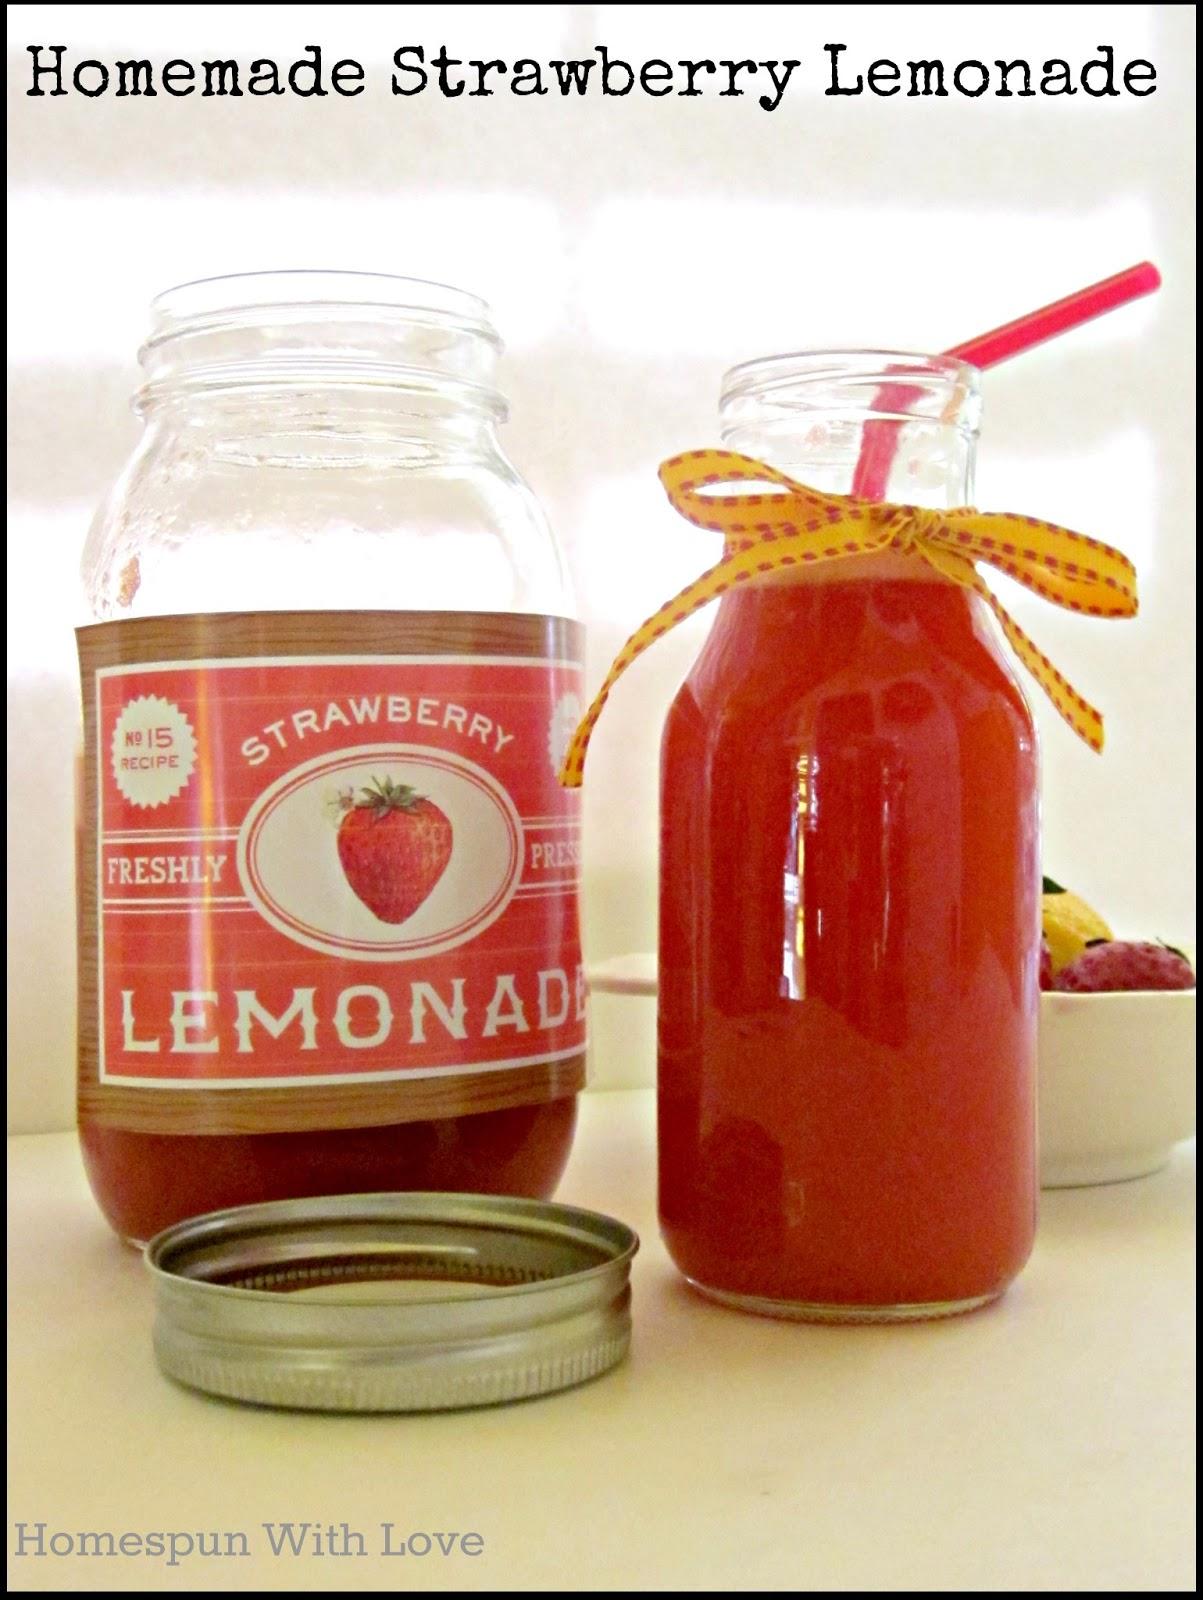 Homespun With Love: Homemade Strawberry Lemonade